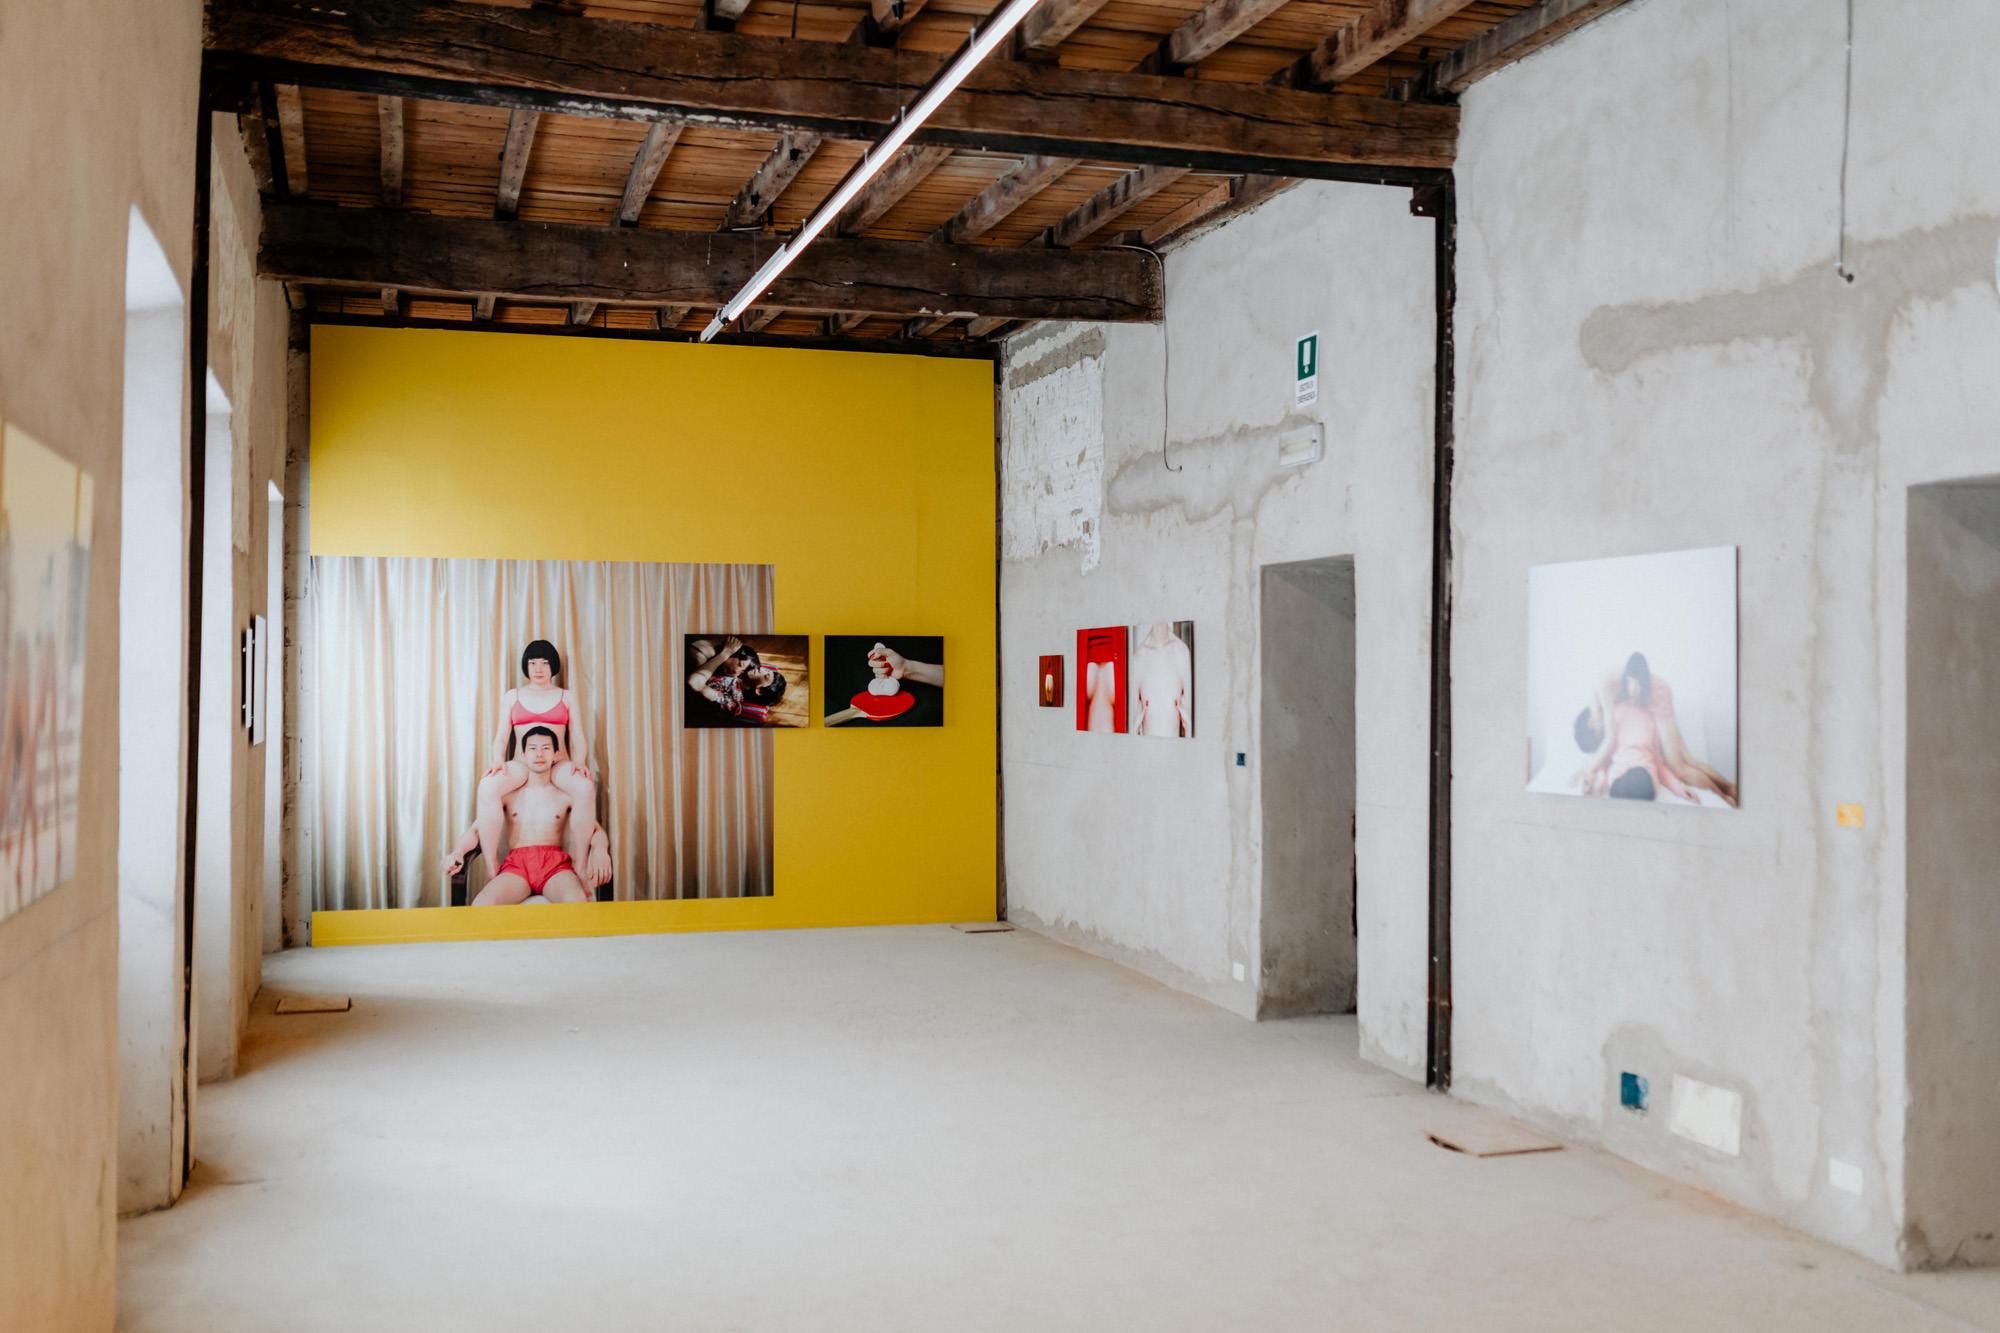 2019 Fotografia Europea, Reggio Emilia, Italy, photo © Giulia Gibertini